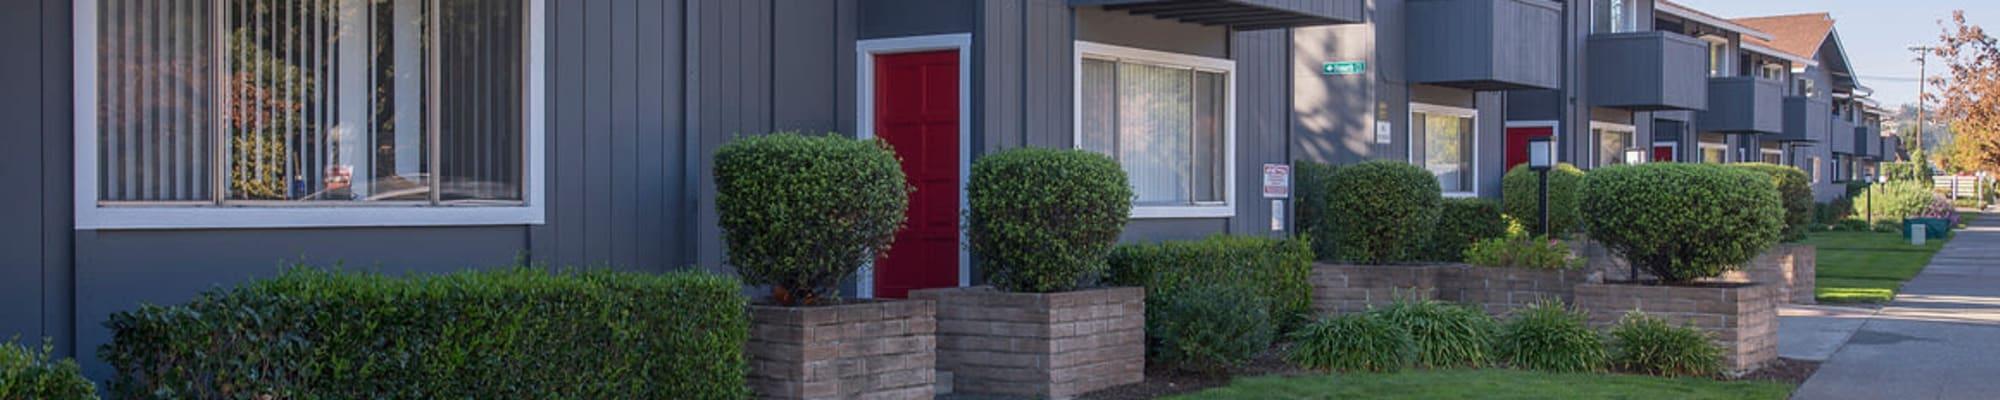 Resident perks at Spring Lake Apartment Homes in Santa Rosa, California